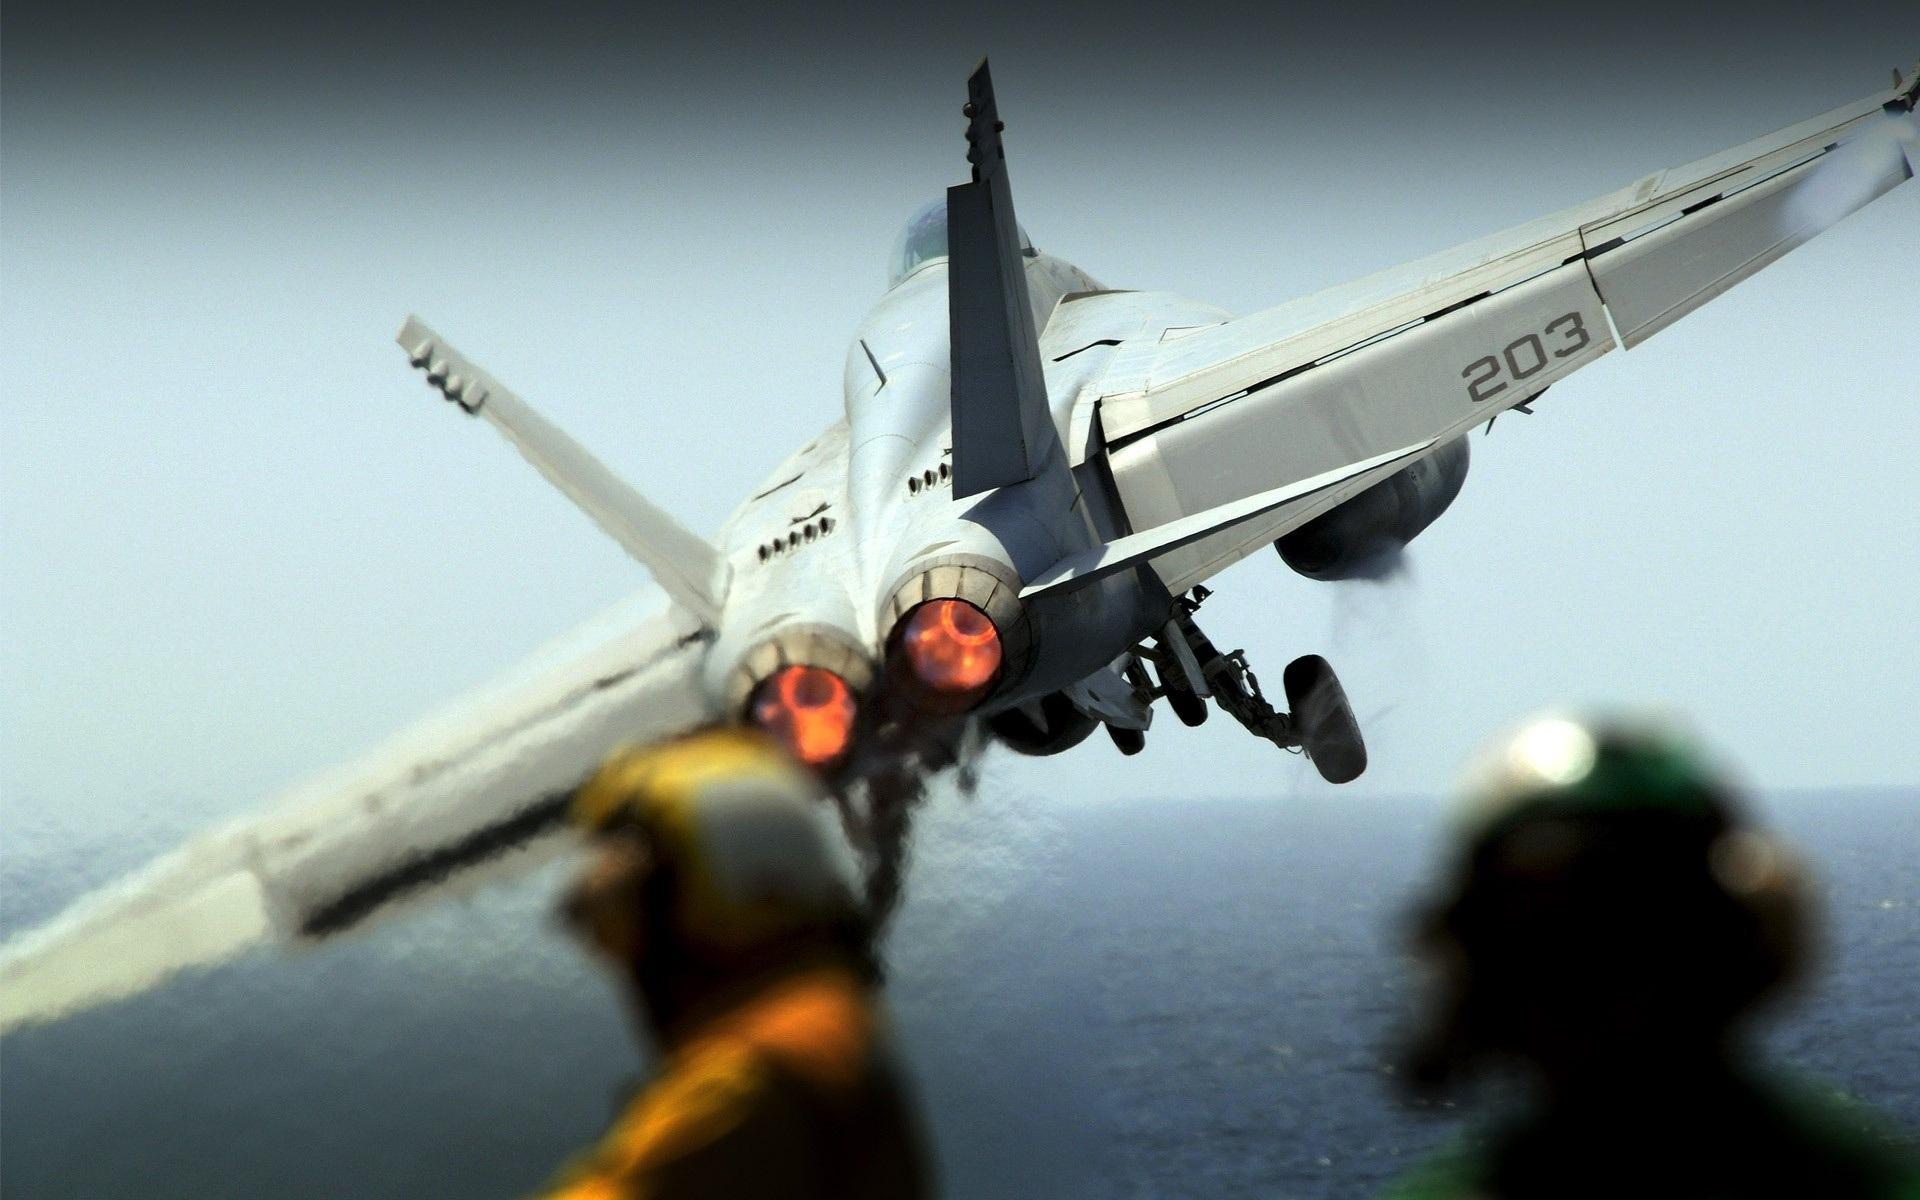 Fighter aircraft photo Wallpaper | 1920x1200 resolution ...